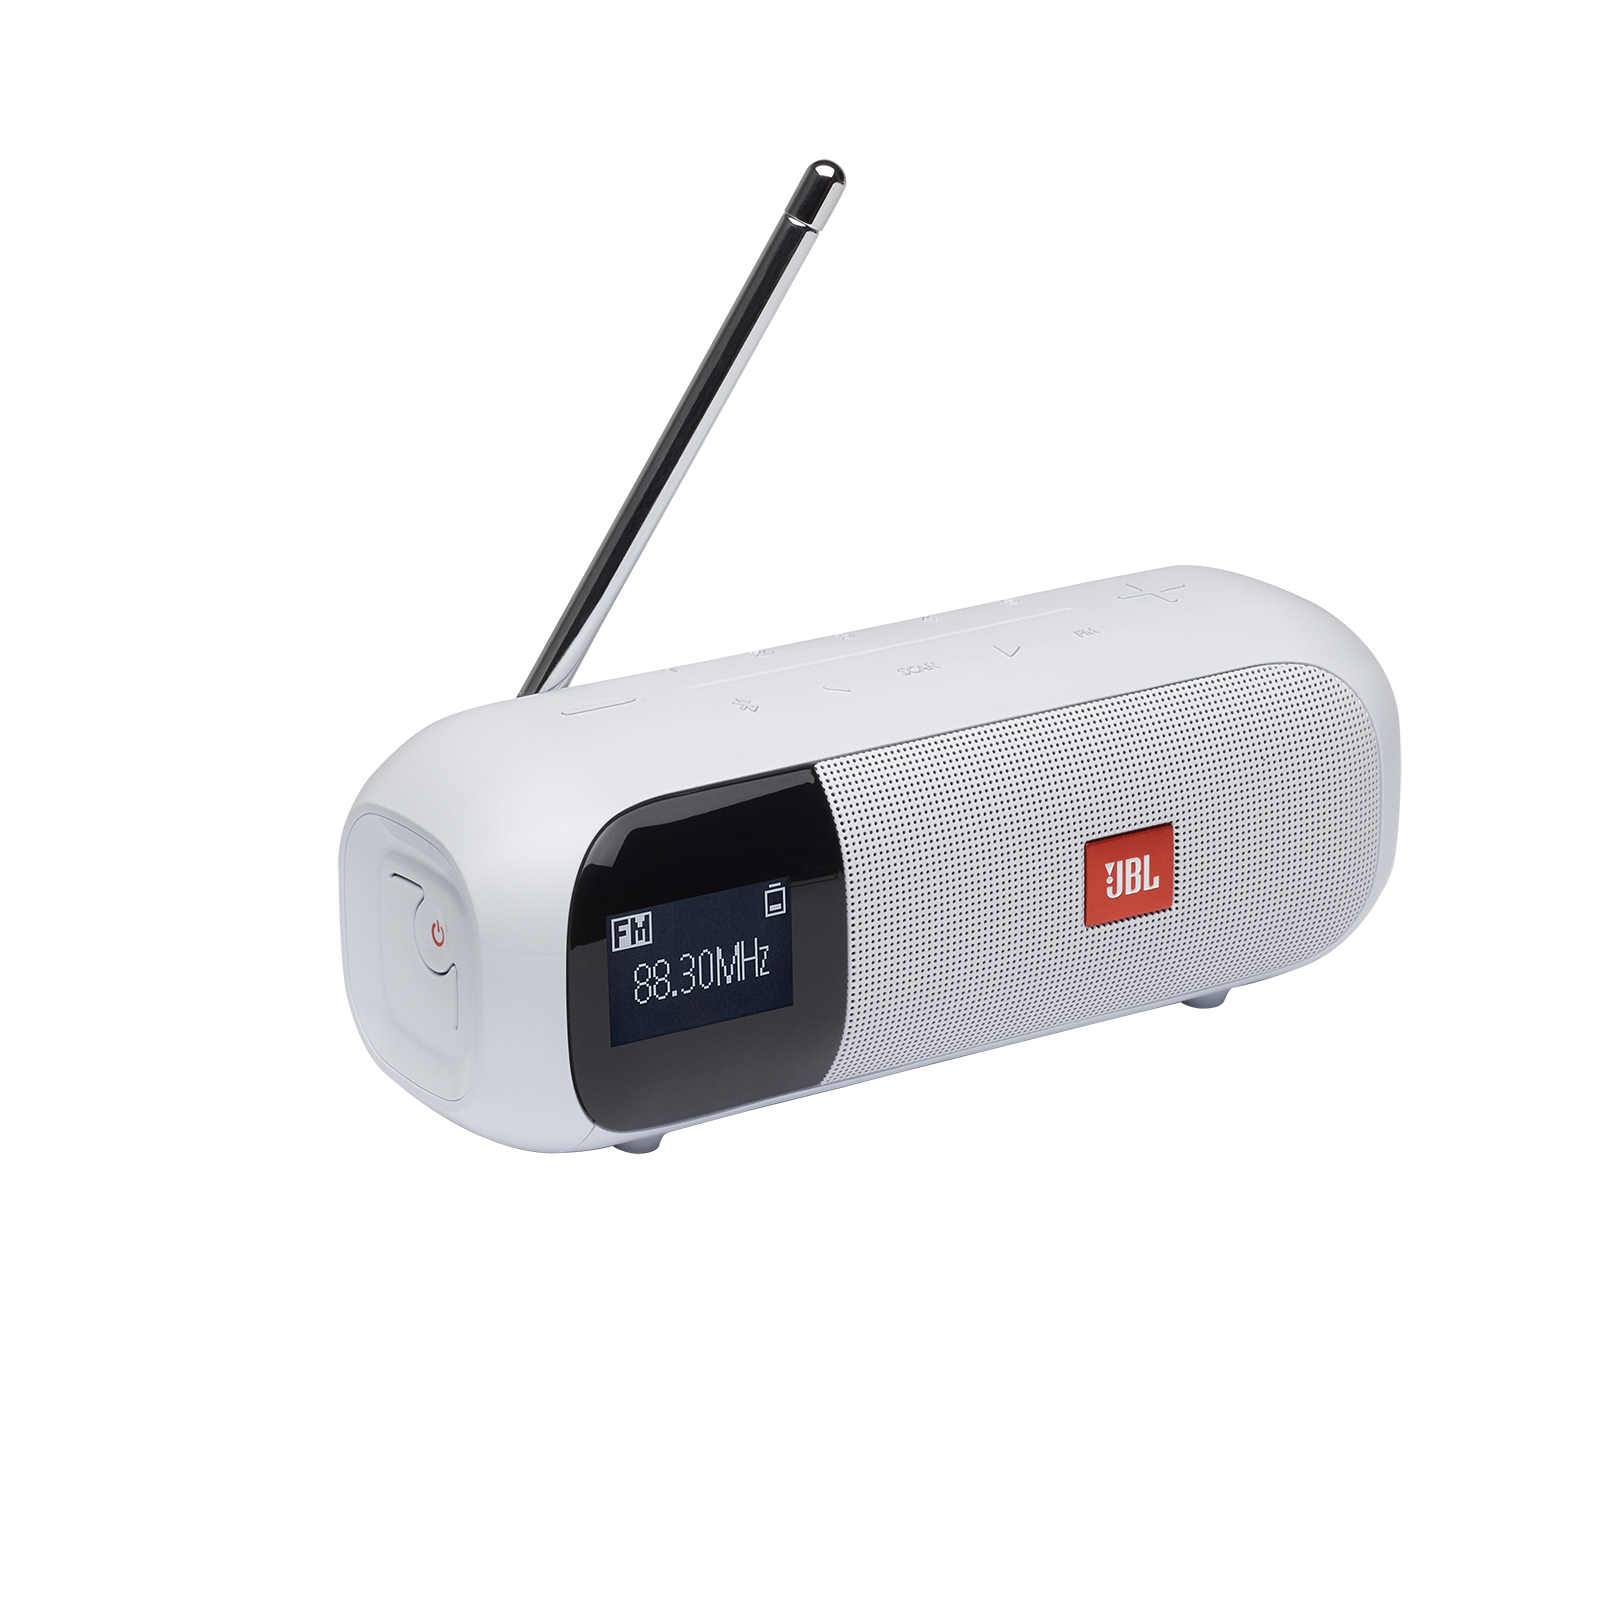 JBL Tuner 2 FM - White - Portable FM radio with Bluetooth - Hero